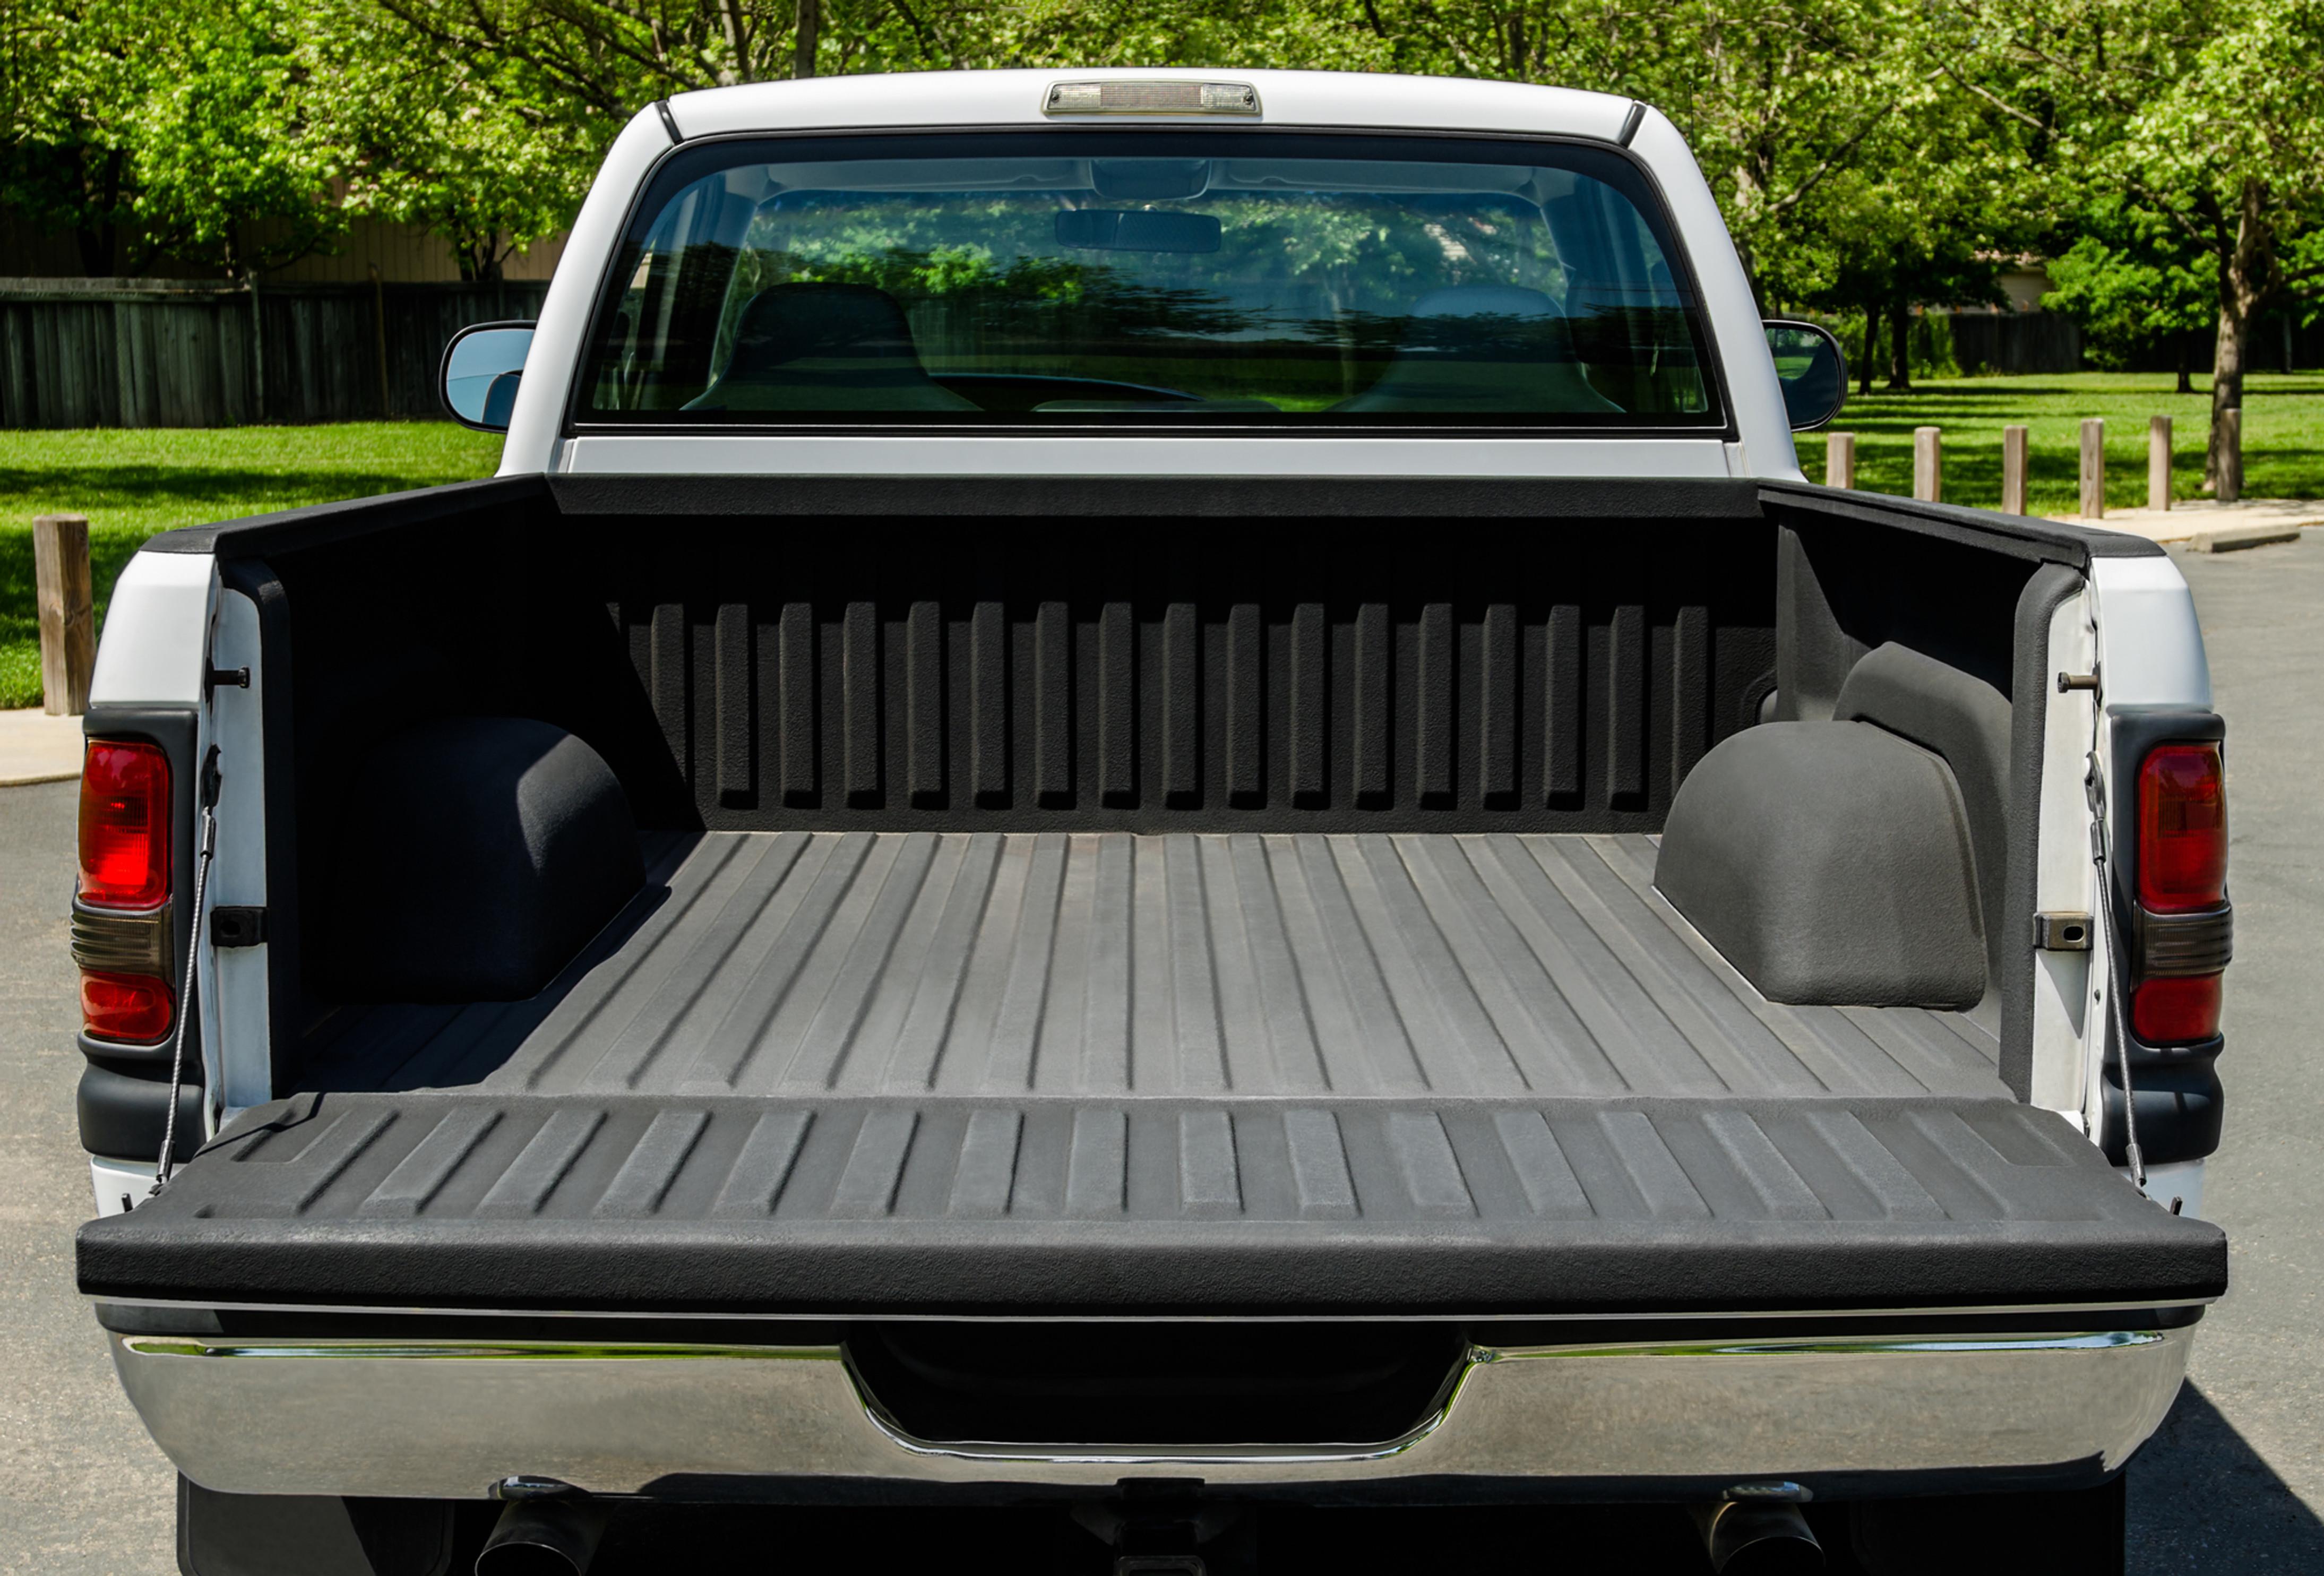 Express Exterior: Truck | SUV